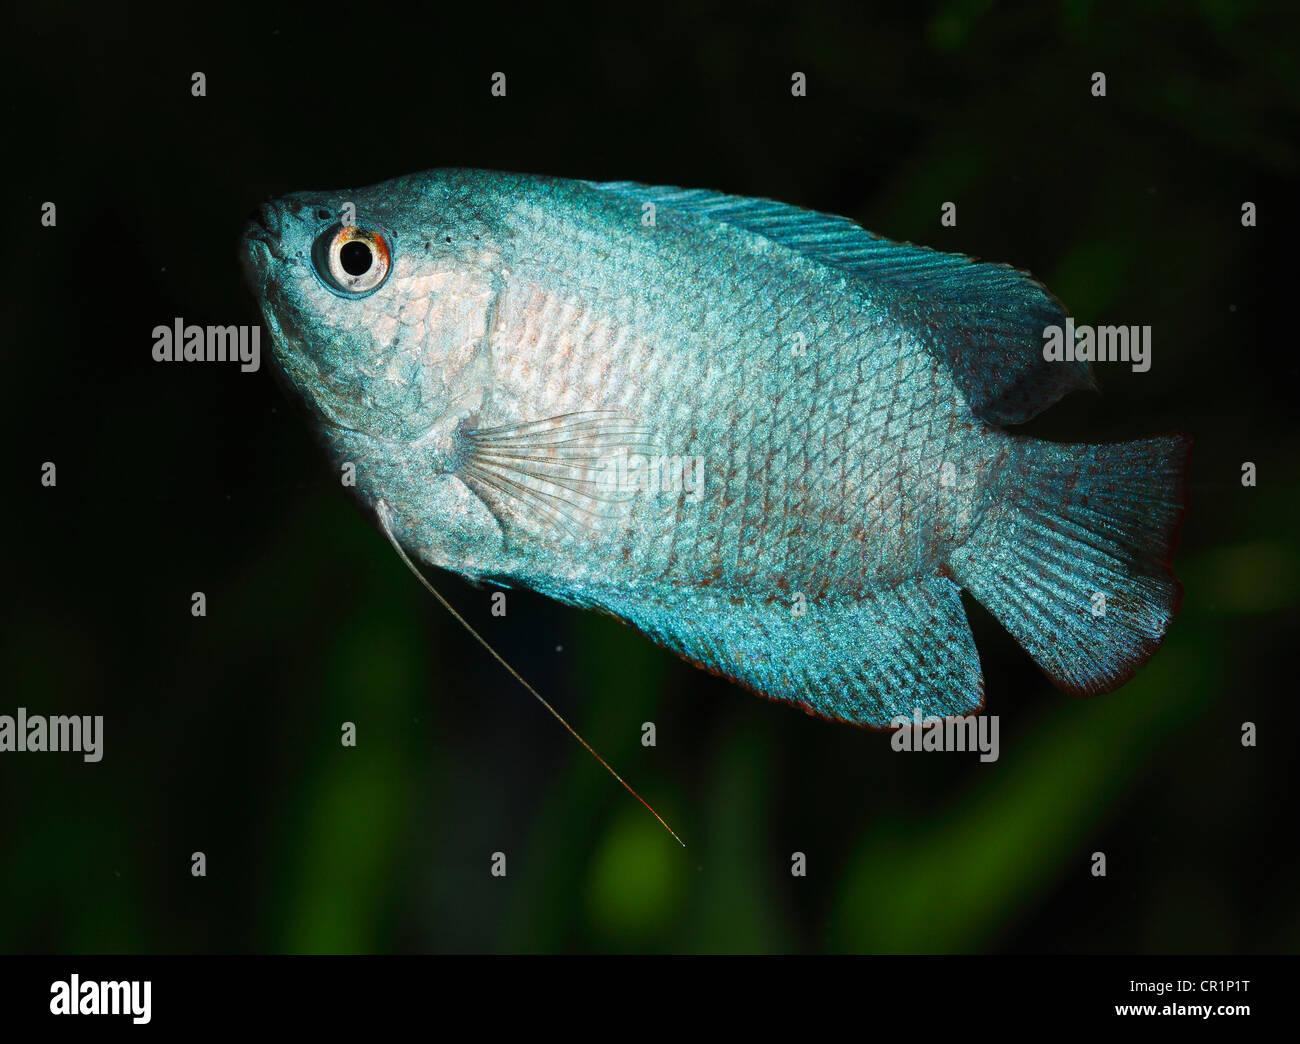 Freshwater aquarium fish neon - Dwarf Gourami Colisa Lalia Male Neon Blue Cultivated Form Freshwater Aquarium Fish Native To India